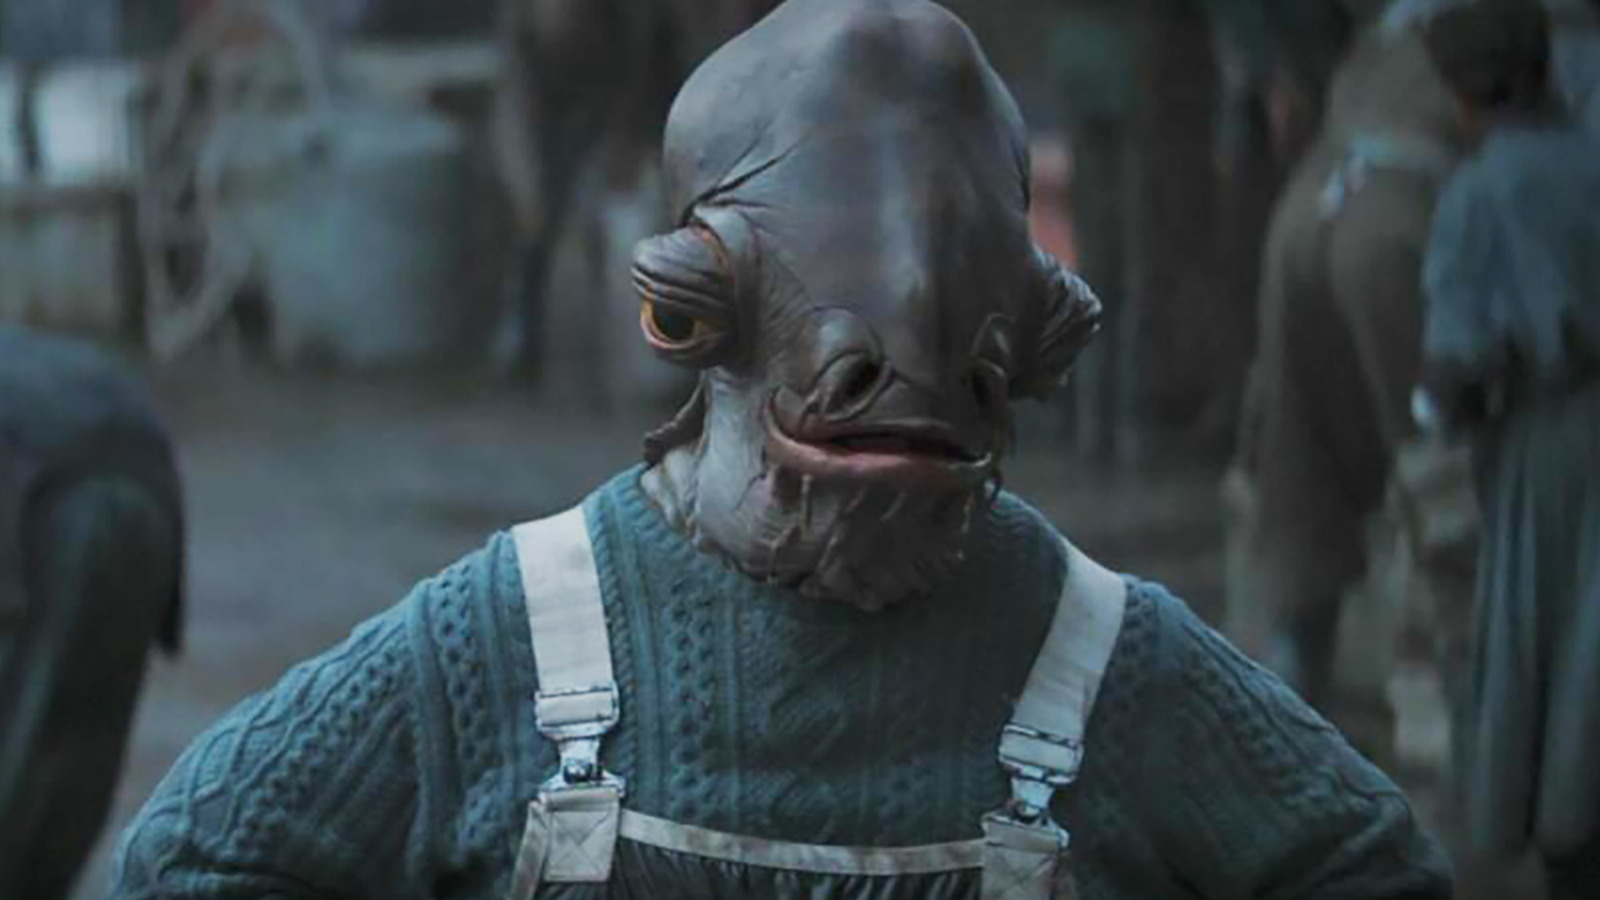 Star Wars: The Mon Calamari explained